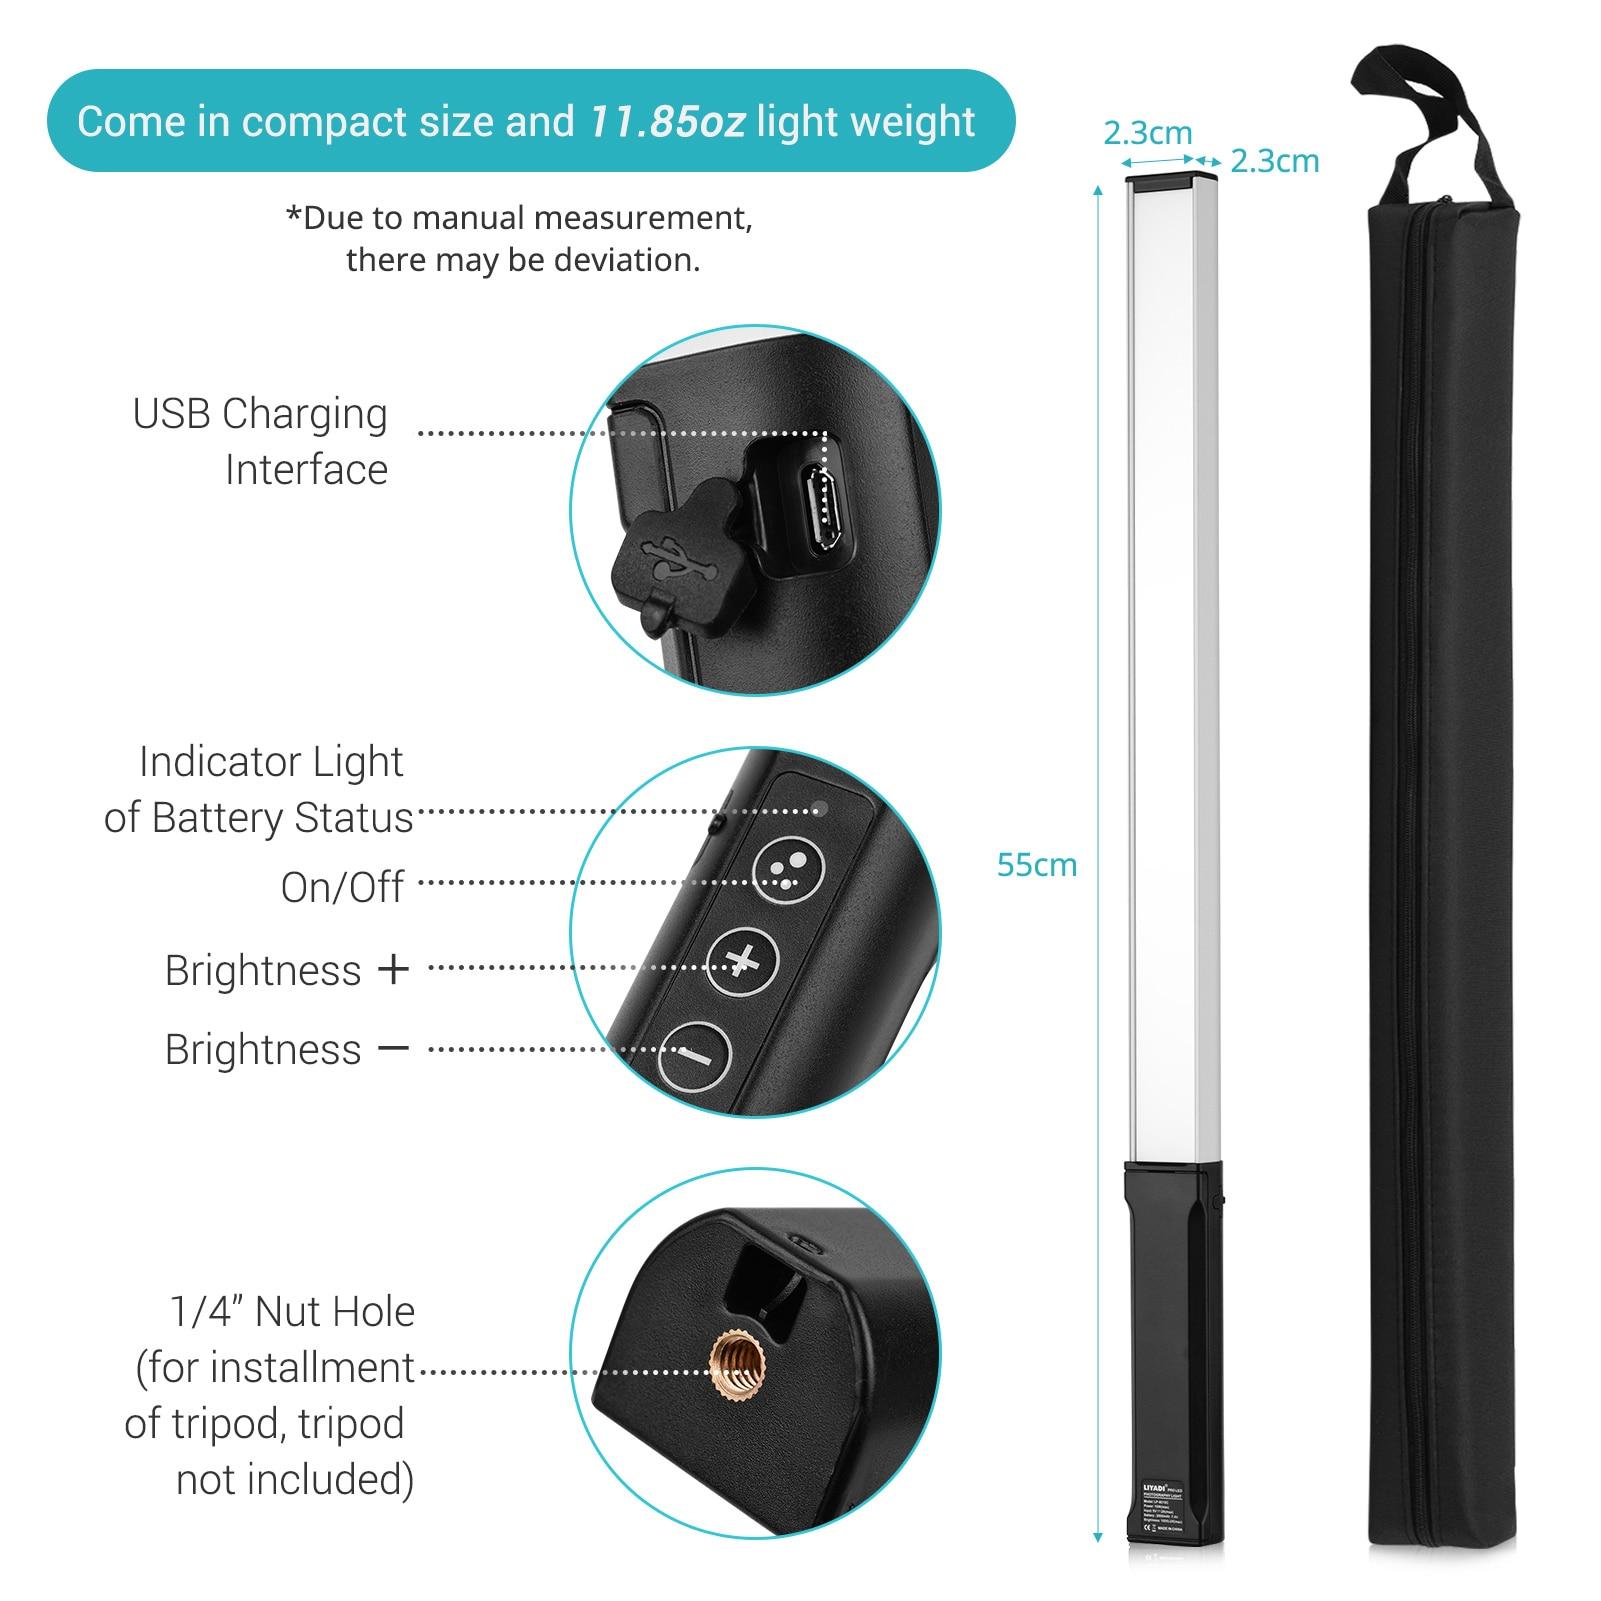 RGB Handheld LED Light Wand Rechargeable Photography Light Stick 10 Lighting Modes 12 Brightness Levels 1000 Lumens 3200-5600K enlarge